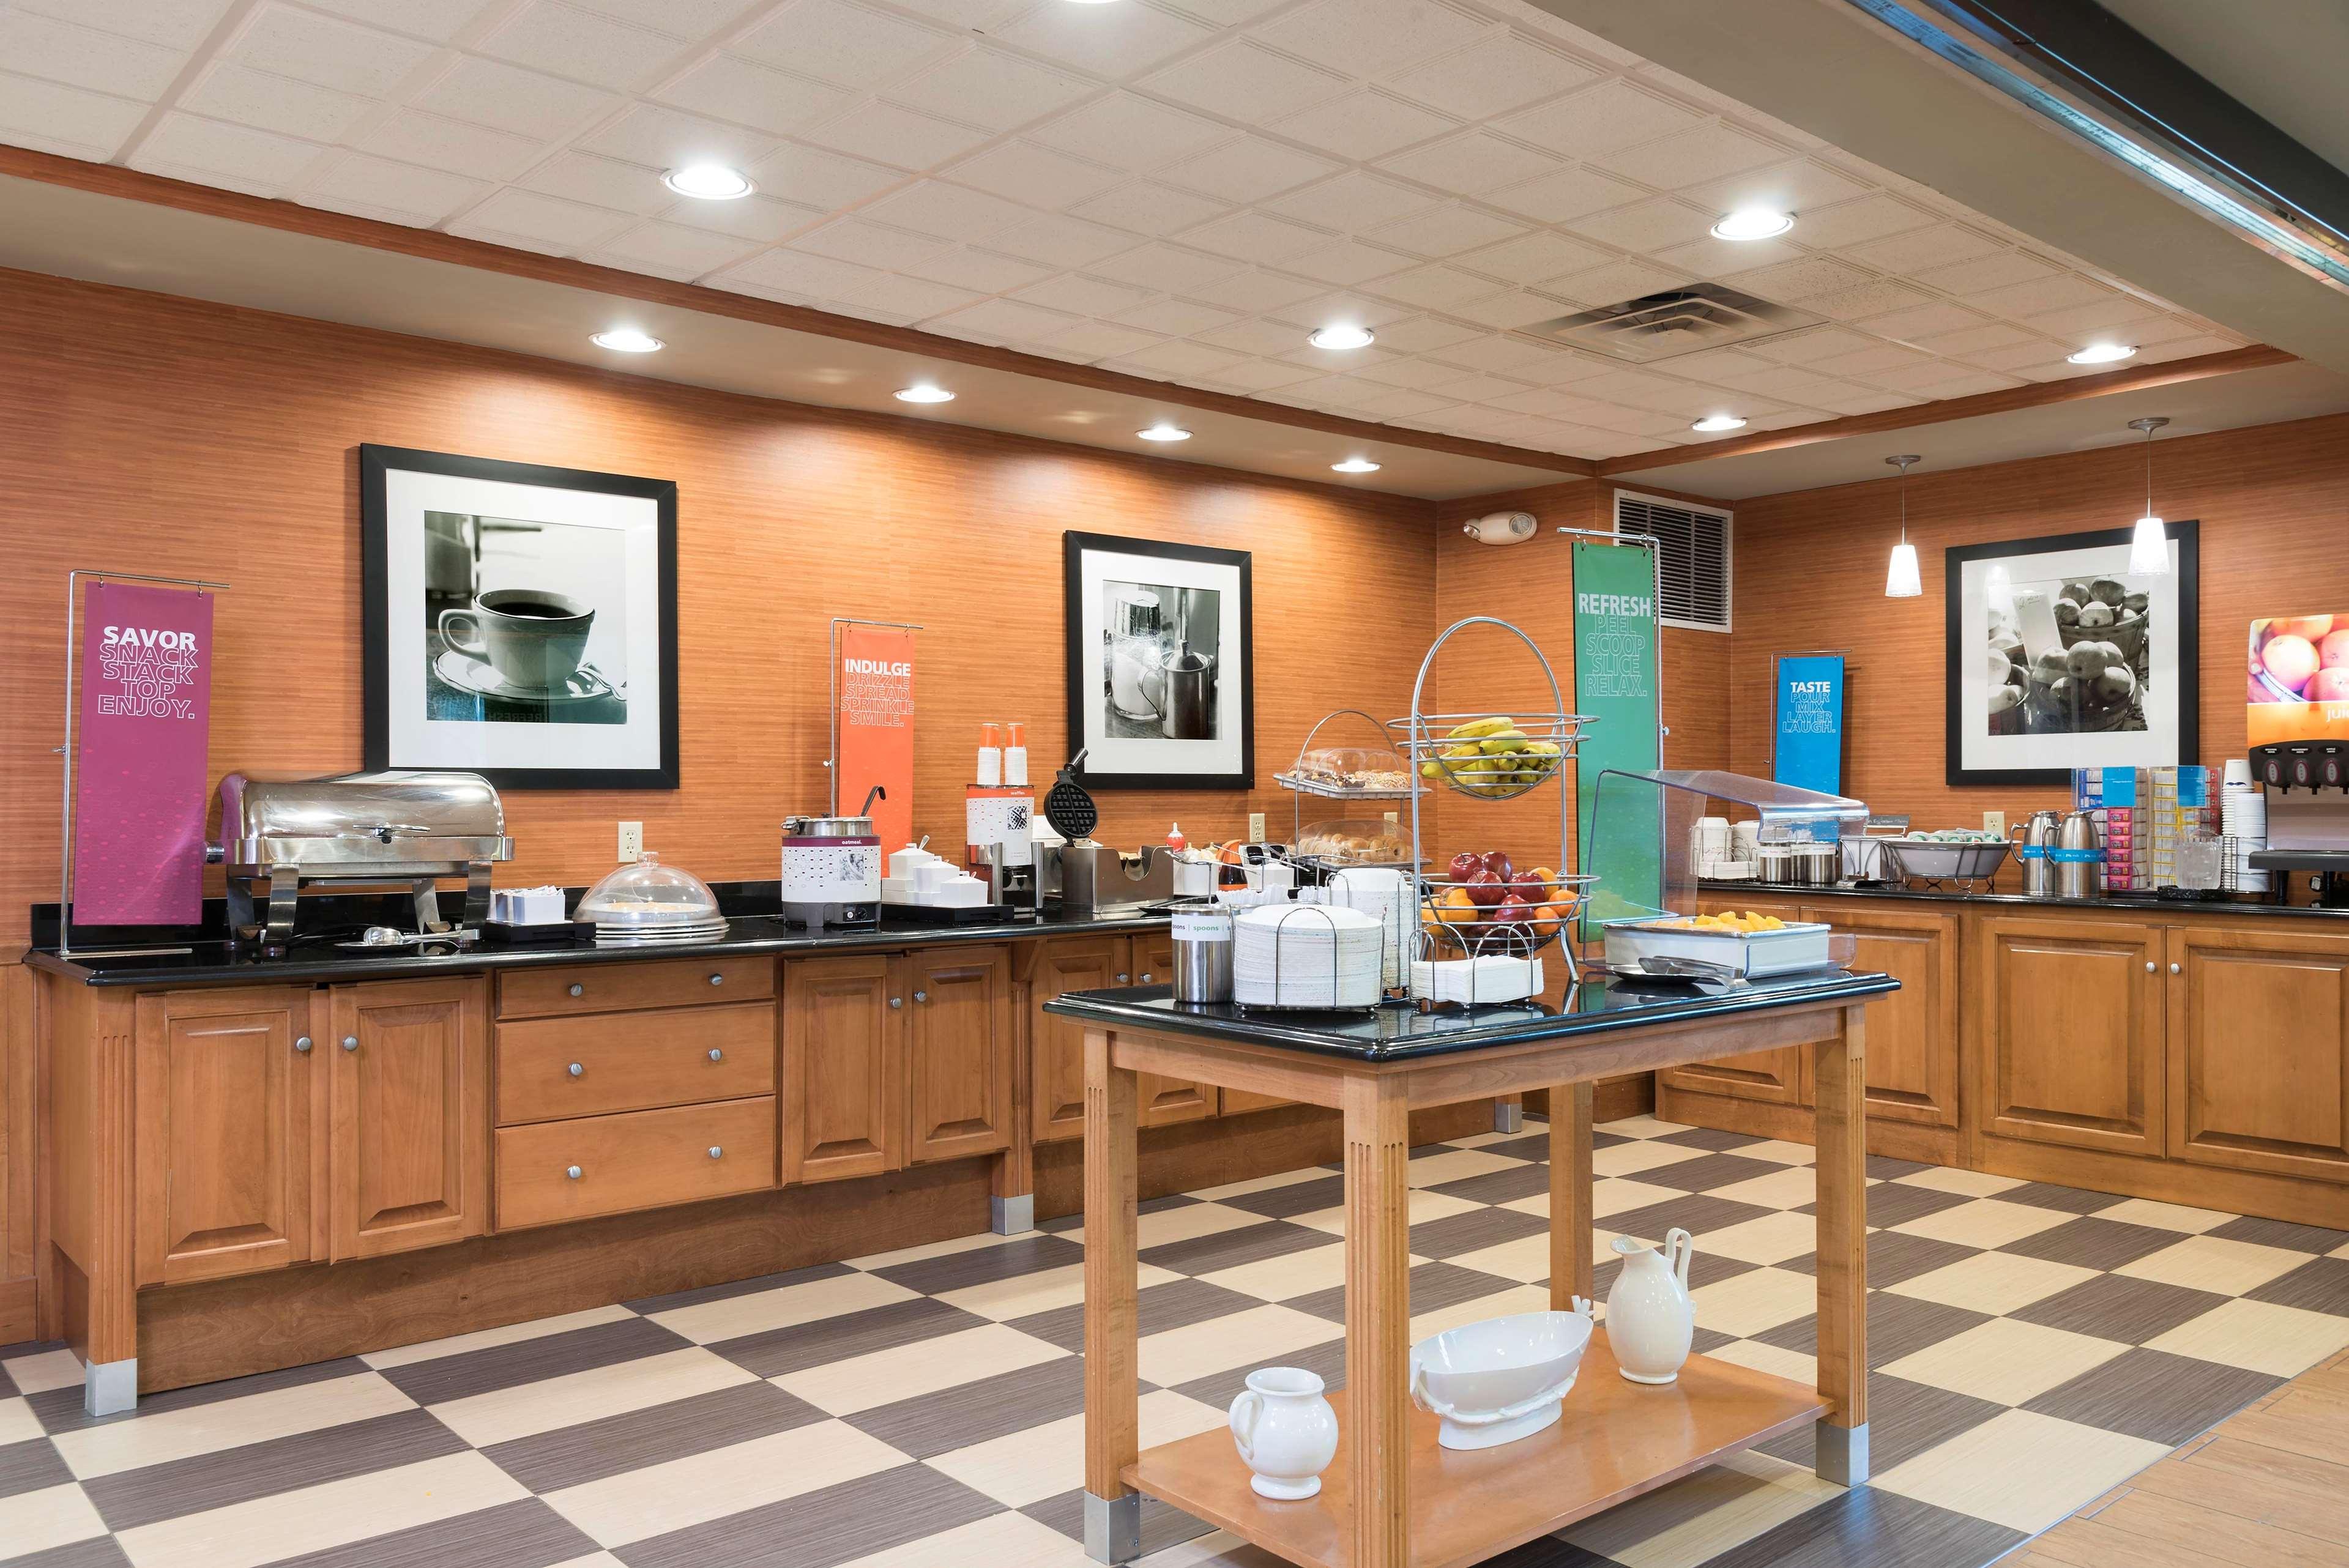 Hampton Inn & Suites Mansfield-South @ I-71 image 17